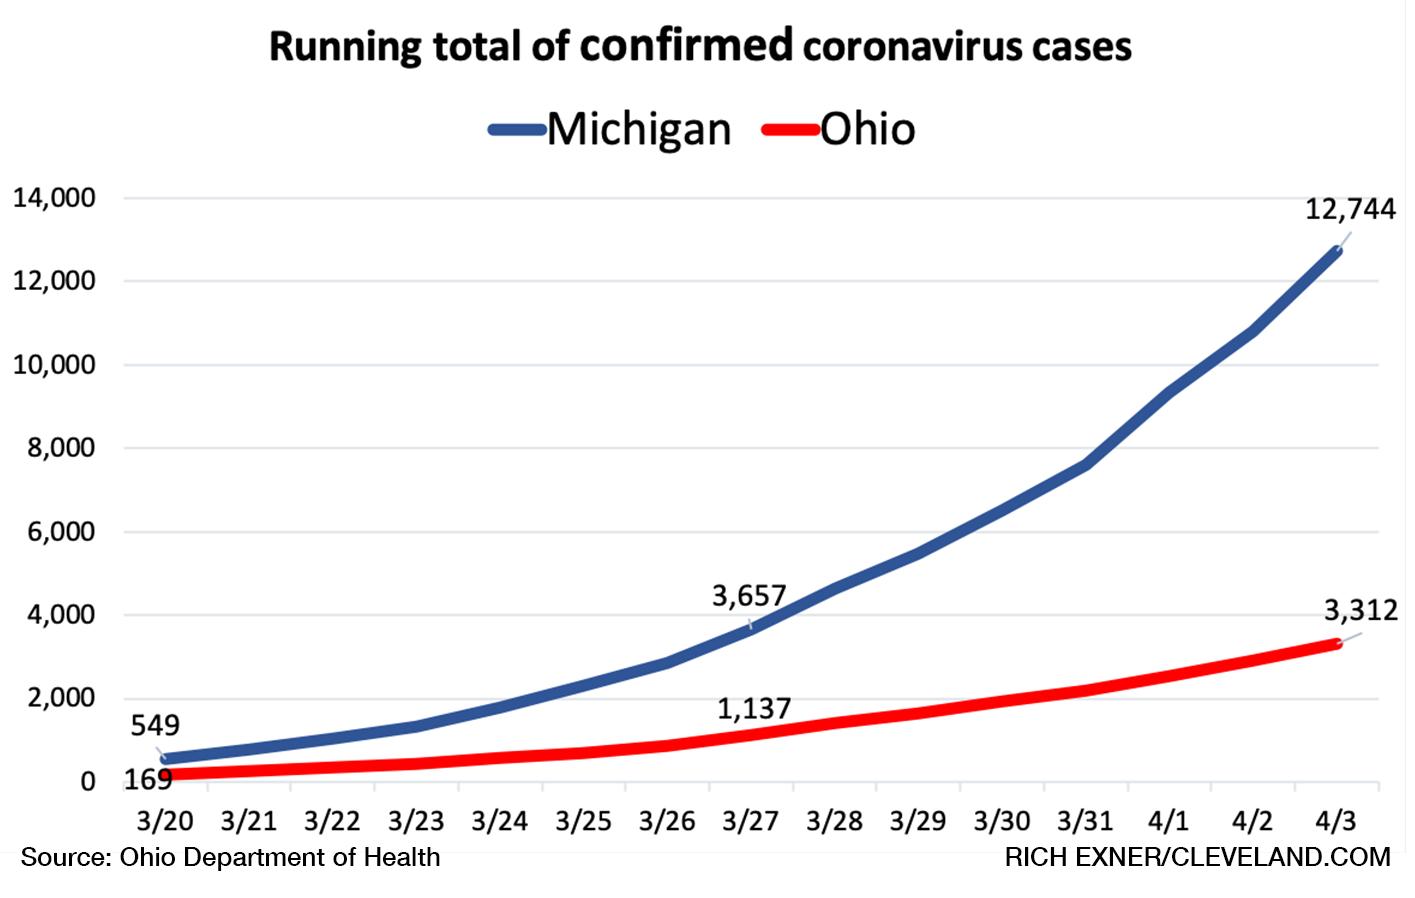 Michigan Now Has Quadruple Ohio S Coronavirus Cases What S Causing The Difference Cleveland Com